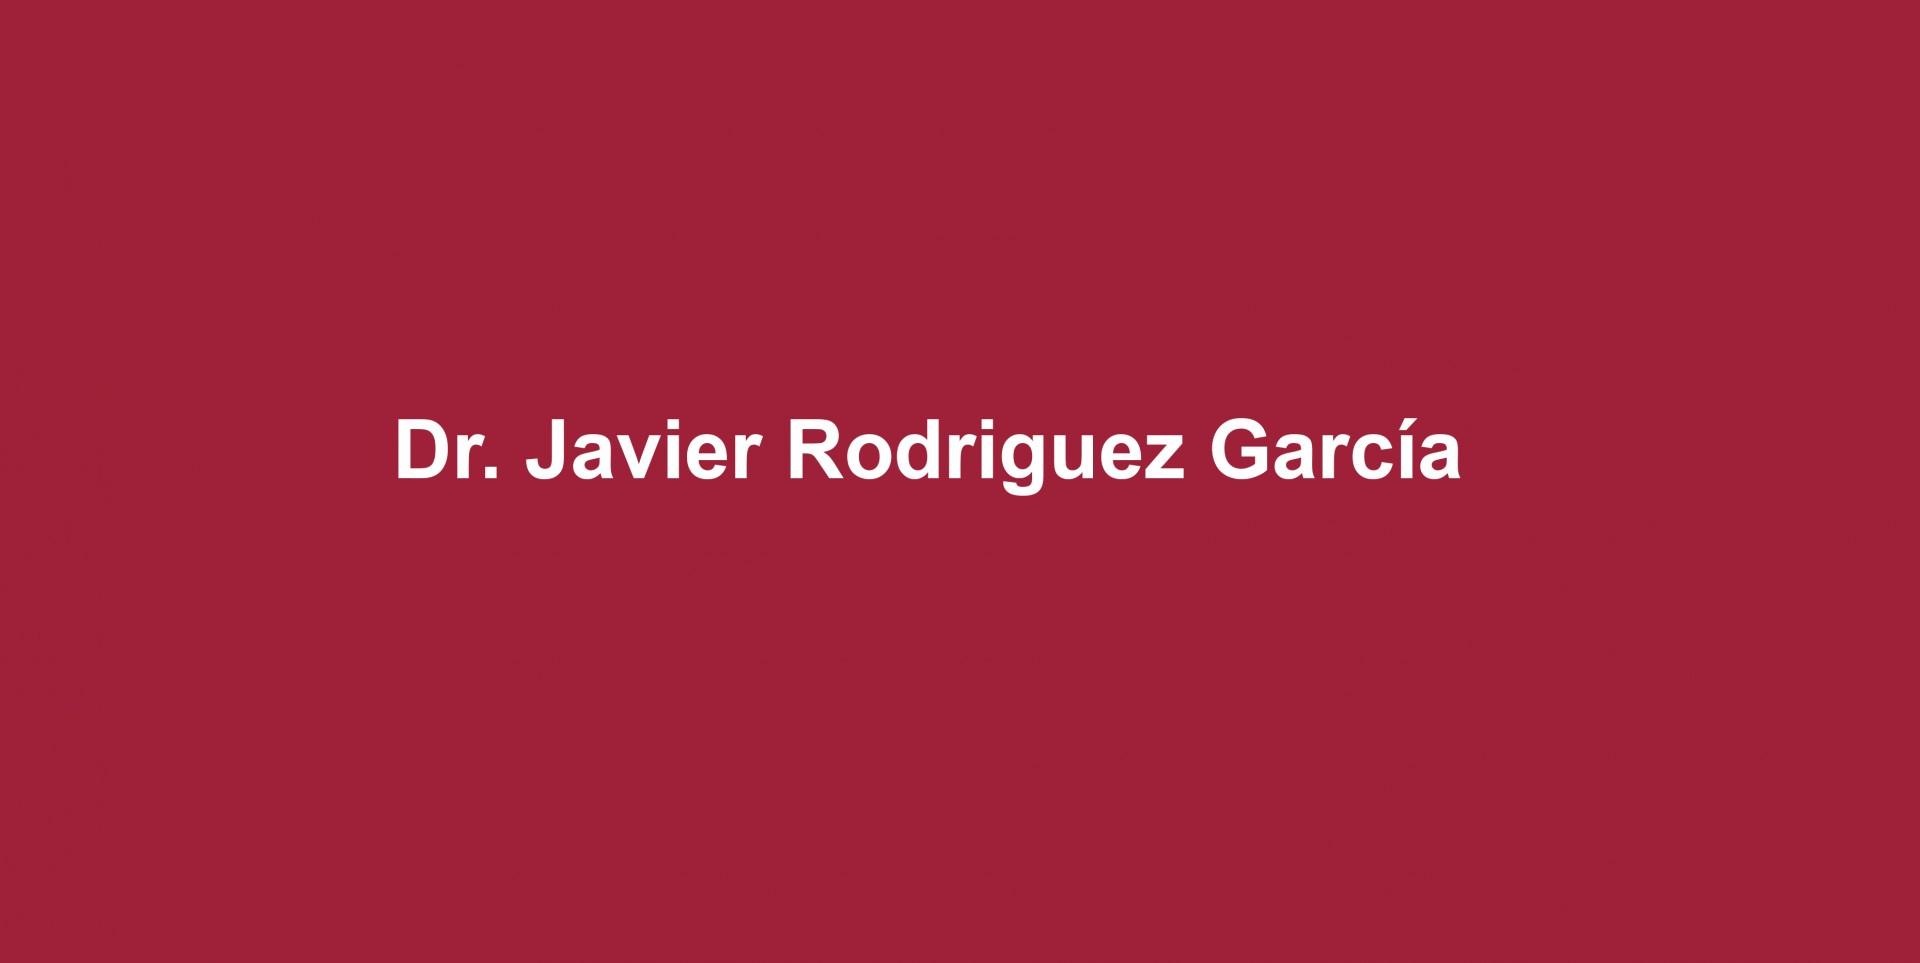 Dr. Javier Rodríguez García